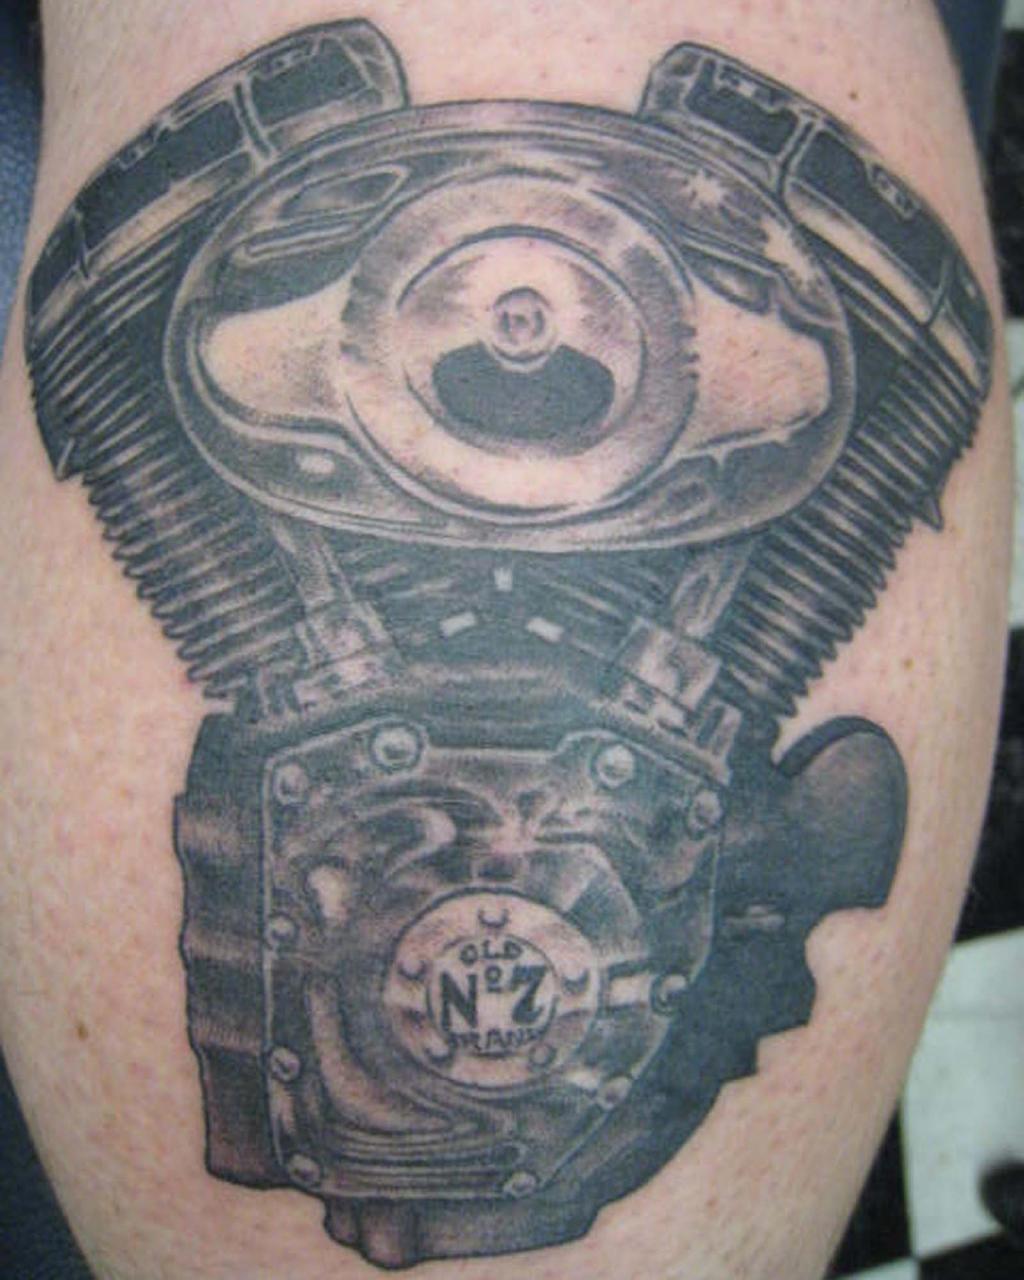 Harley Davidson engine tattoo hd Nate rogers by Zeek911 on ...